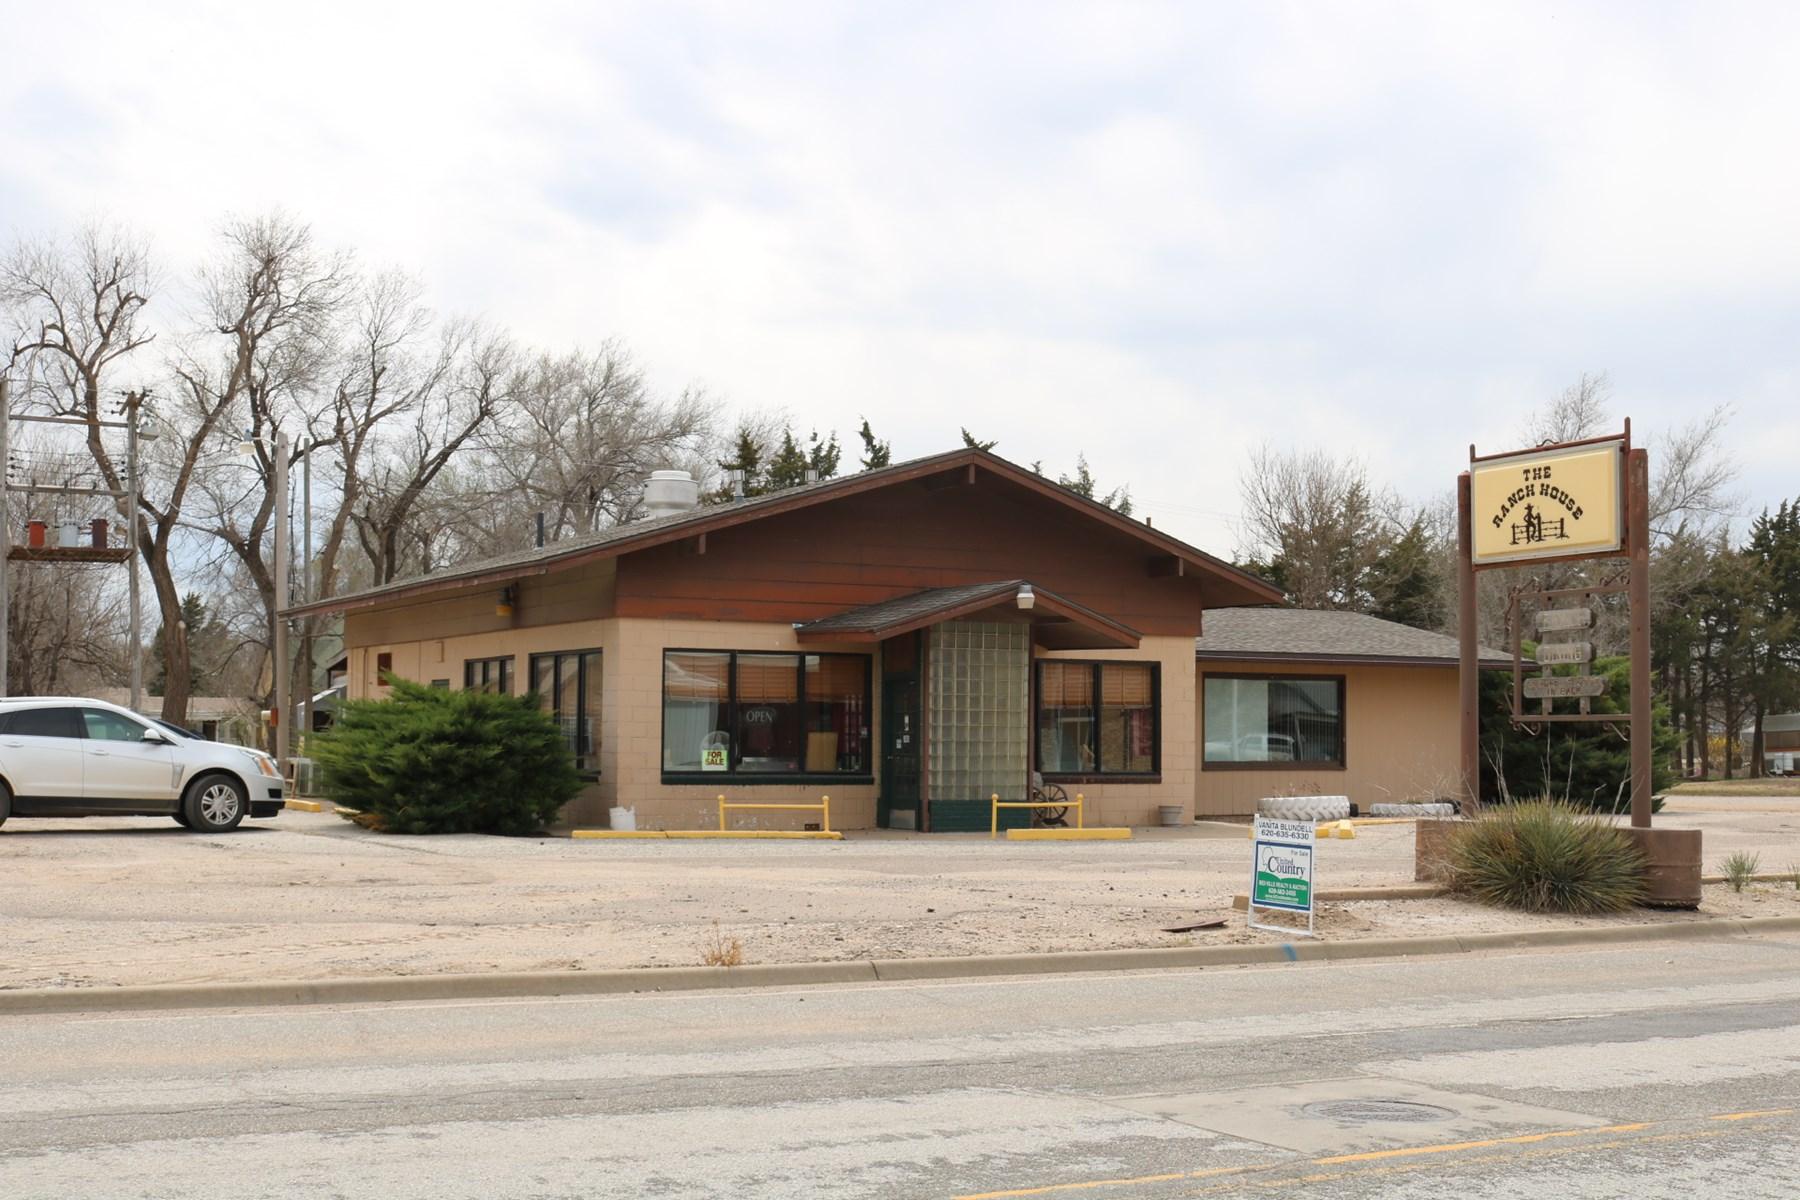 Restaurant and Bar For Sale In Ashland, Clark County, Kansas